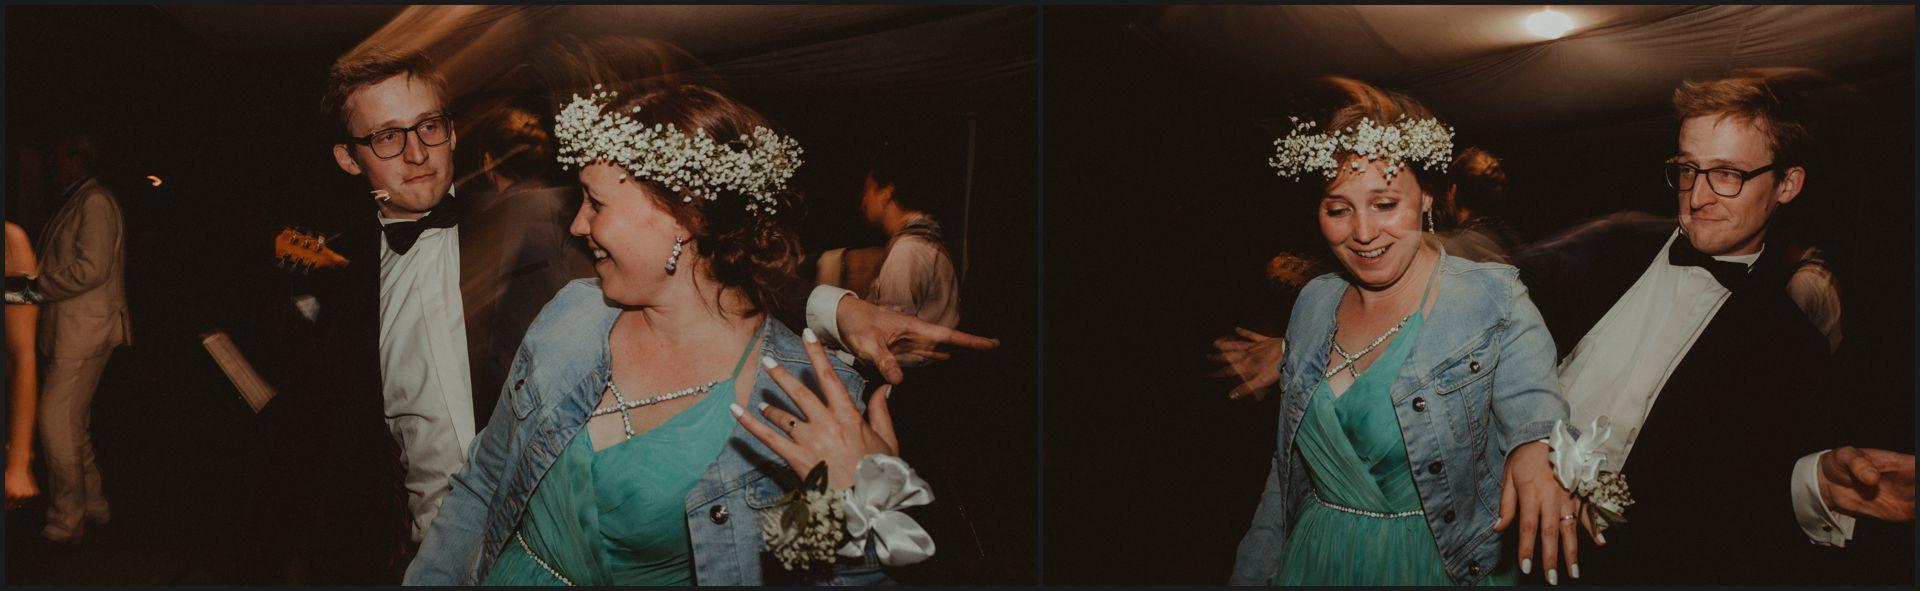 first dance, bride, groom, wedding, umbria, nikis resort, dance, funny, people